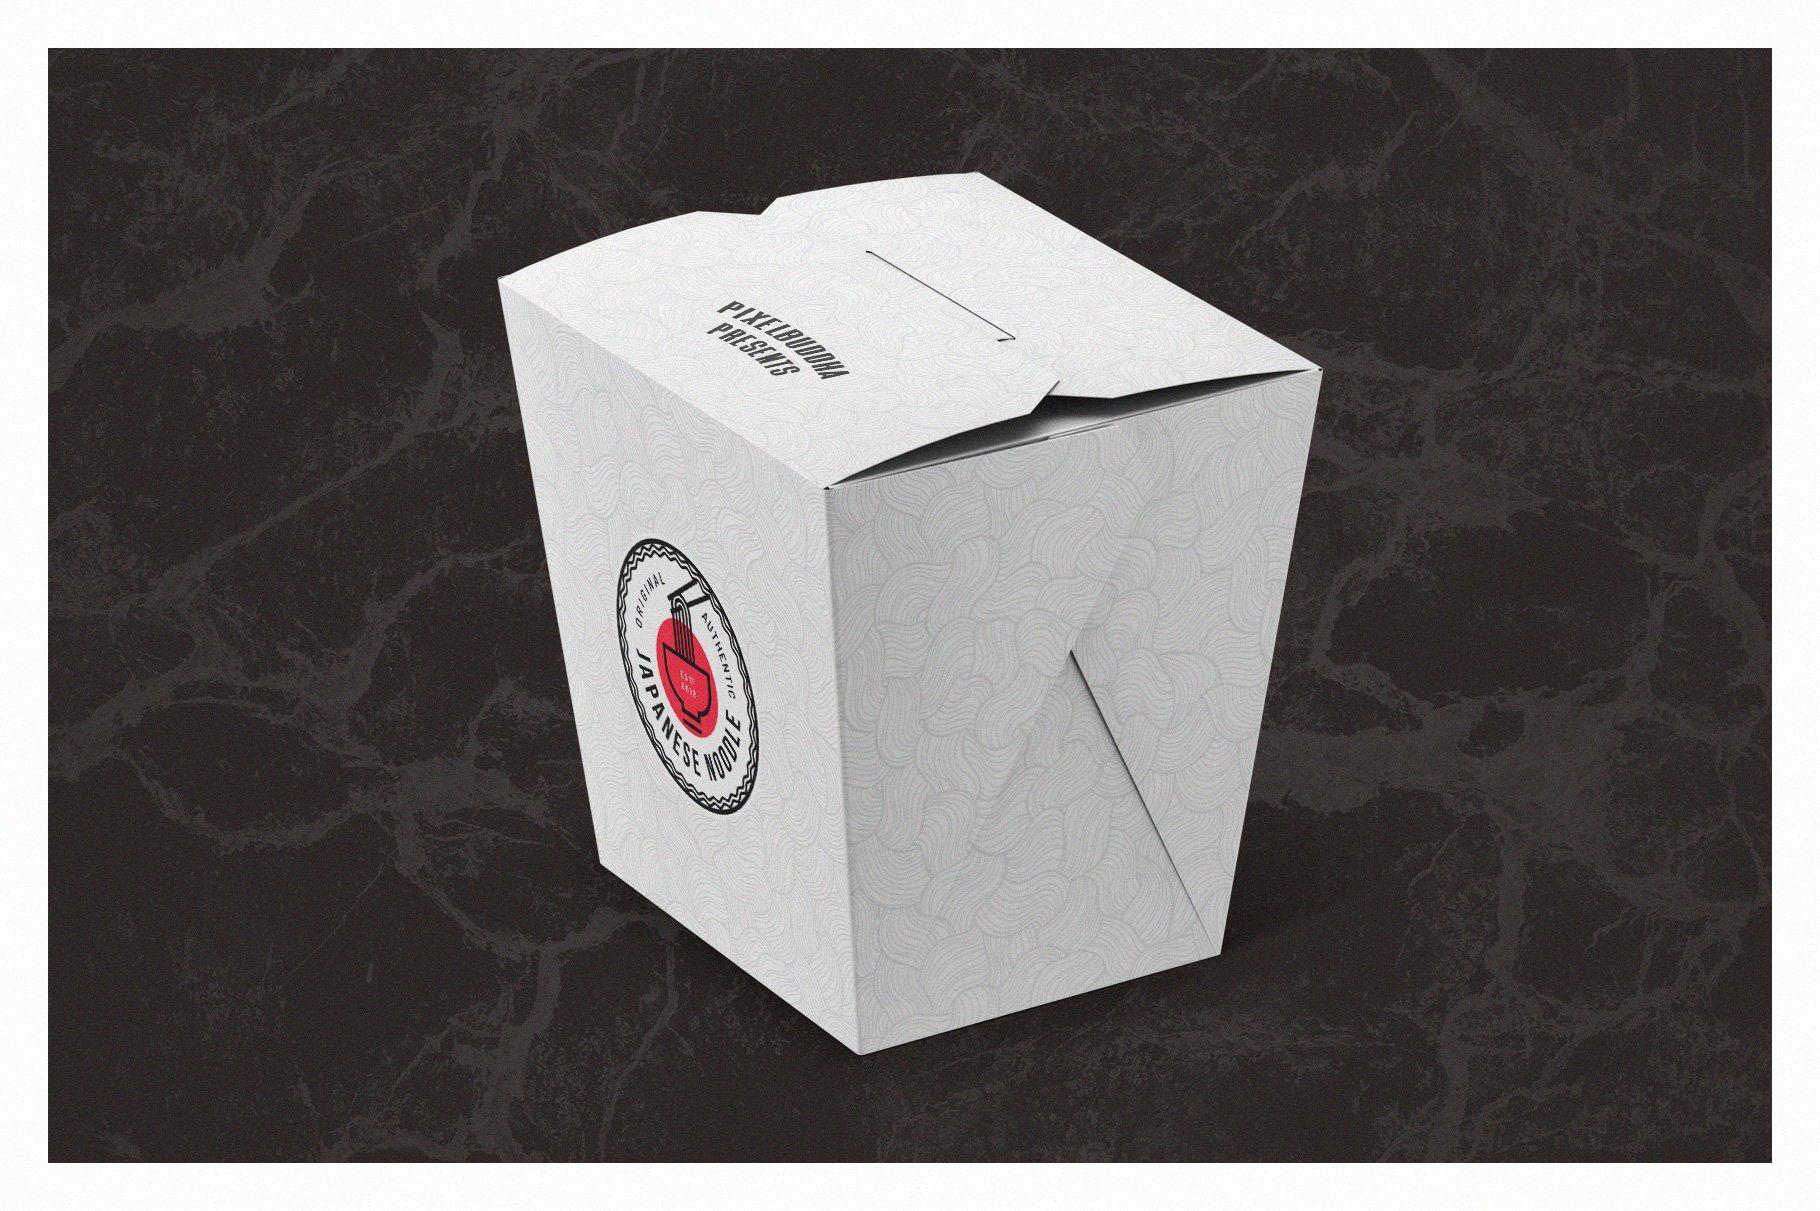 Download Noodles Box Mockup Set Box Mockup Branding Design Coffee Shop Design PSD Mockup Templates